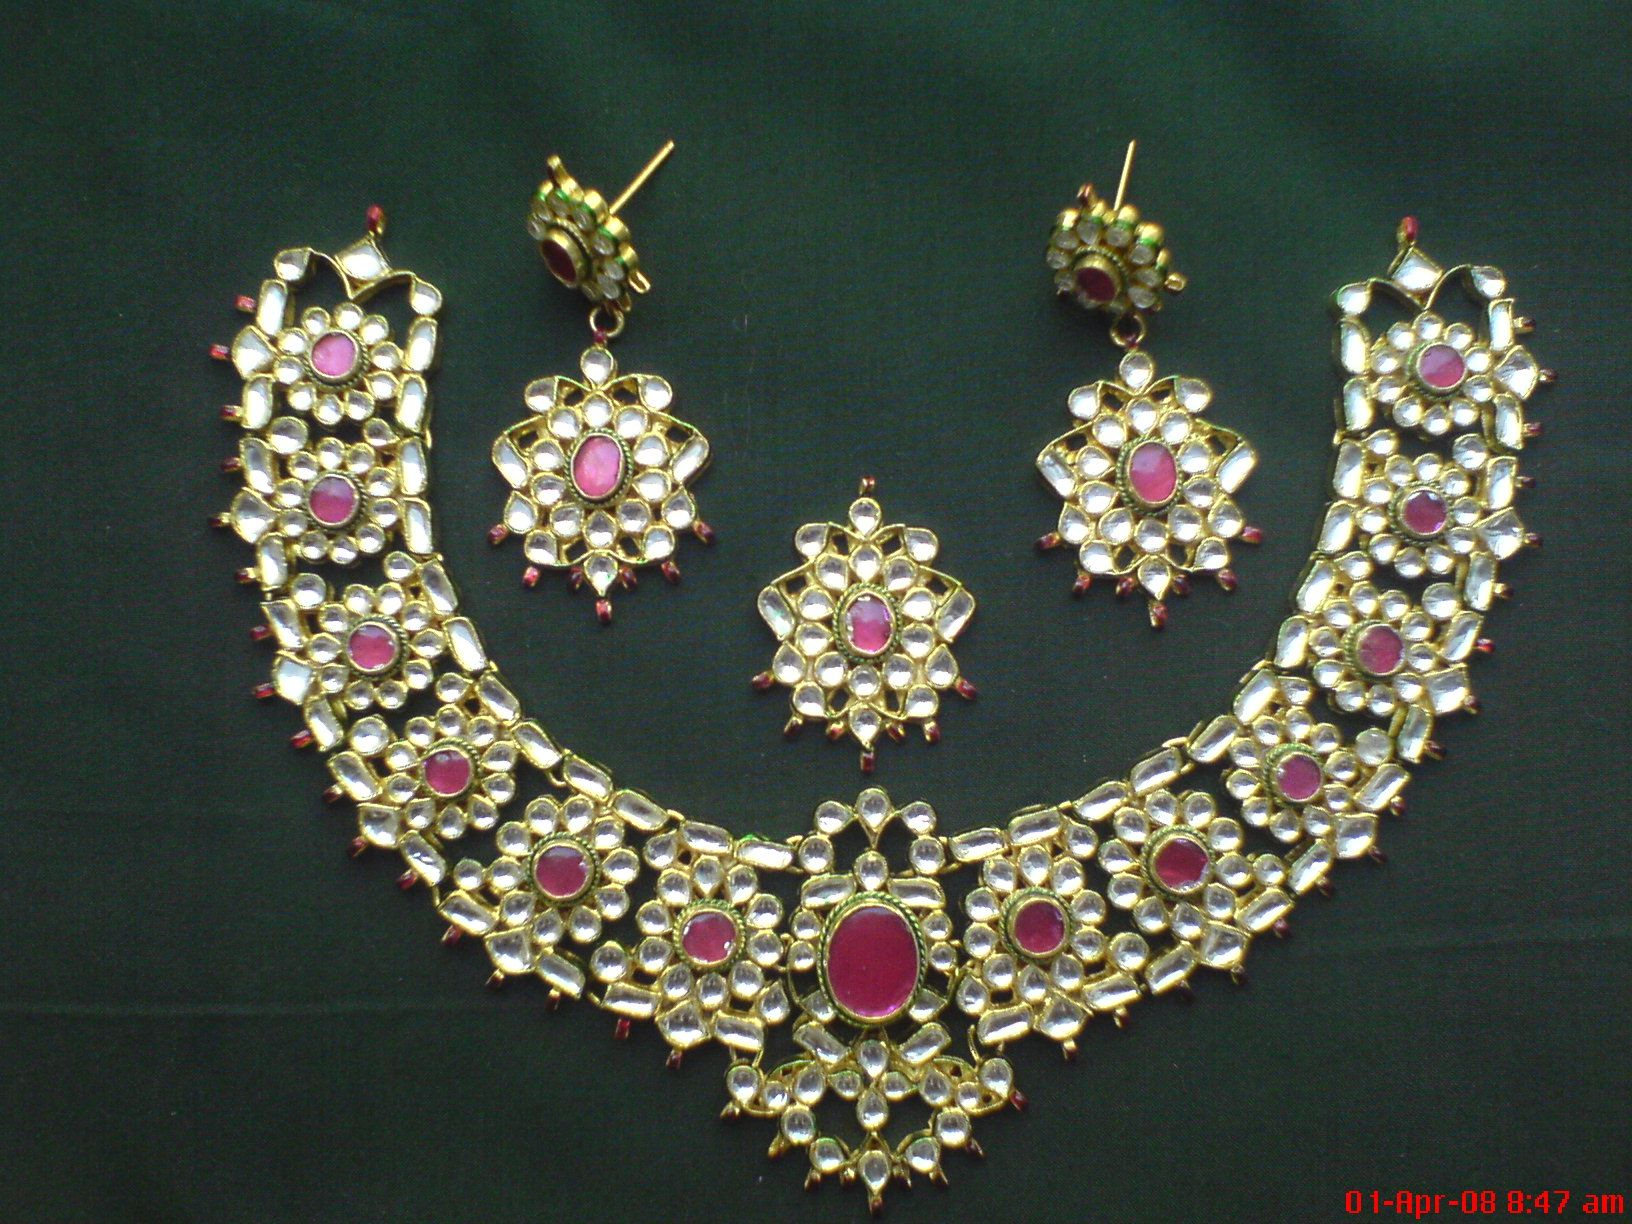 Pin by kay malone on india jewelry pinterest india jewelry